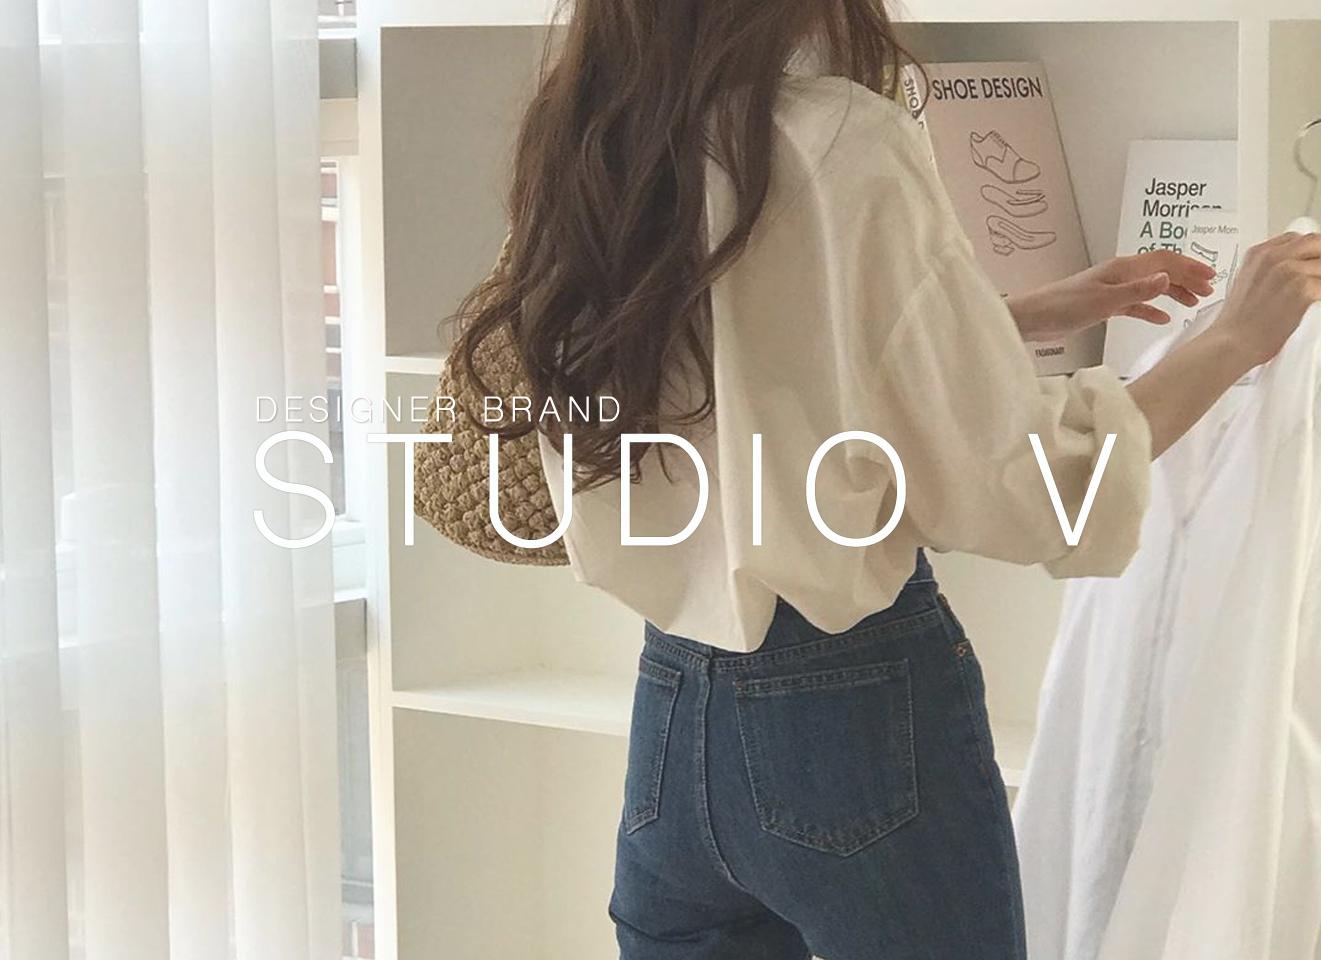 Select Bnlstudio V